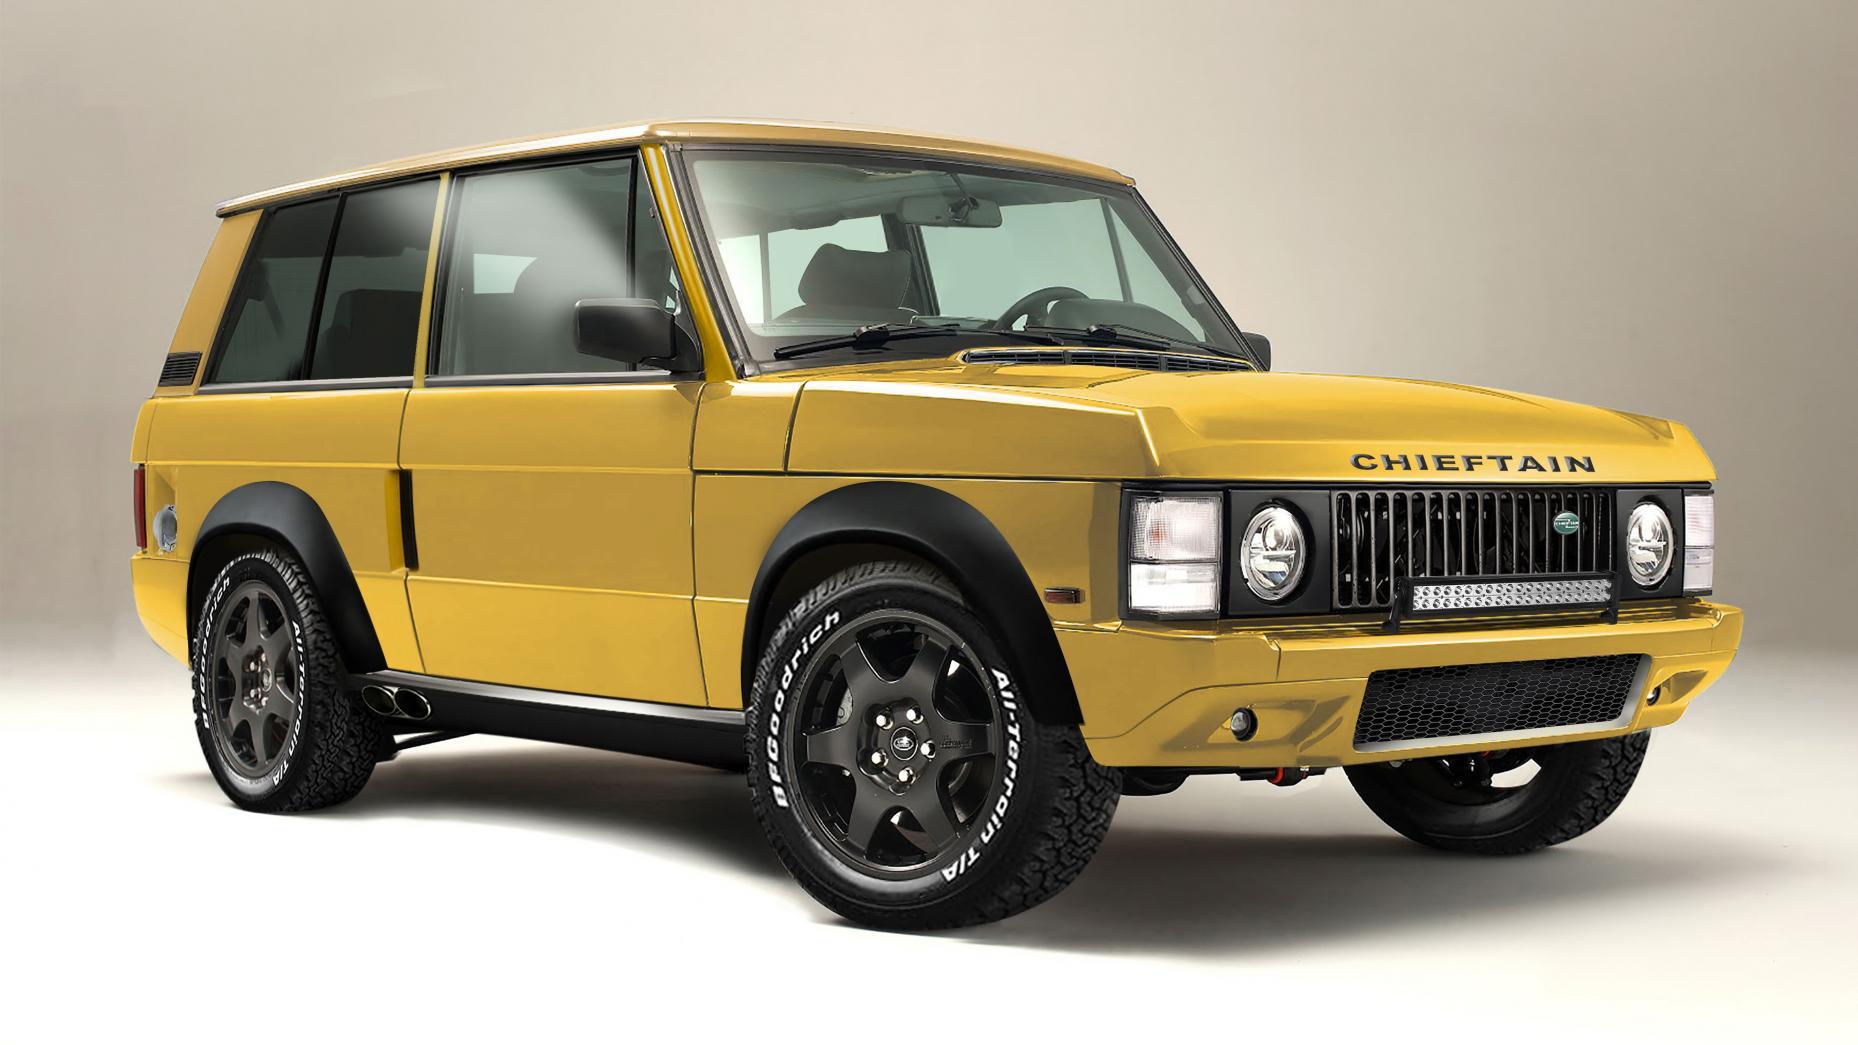 Chieftain Range-Rover Extreme to interpretacja Range Rovera z lat 70